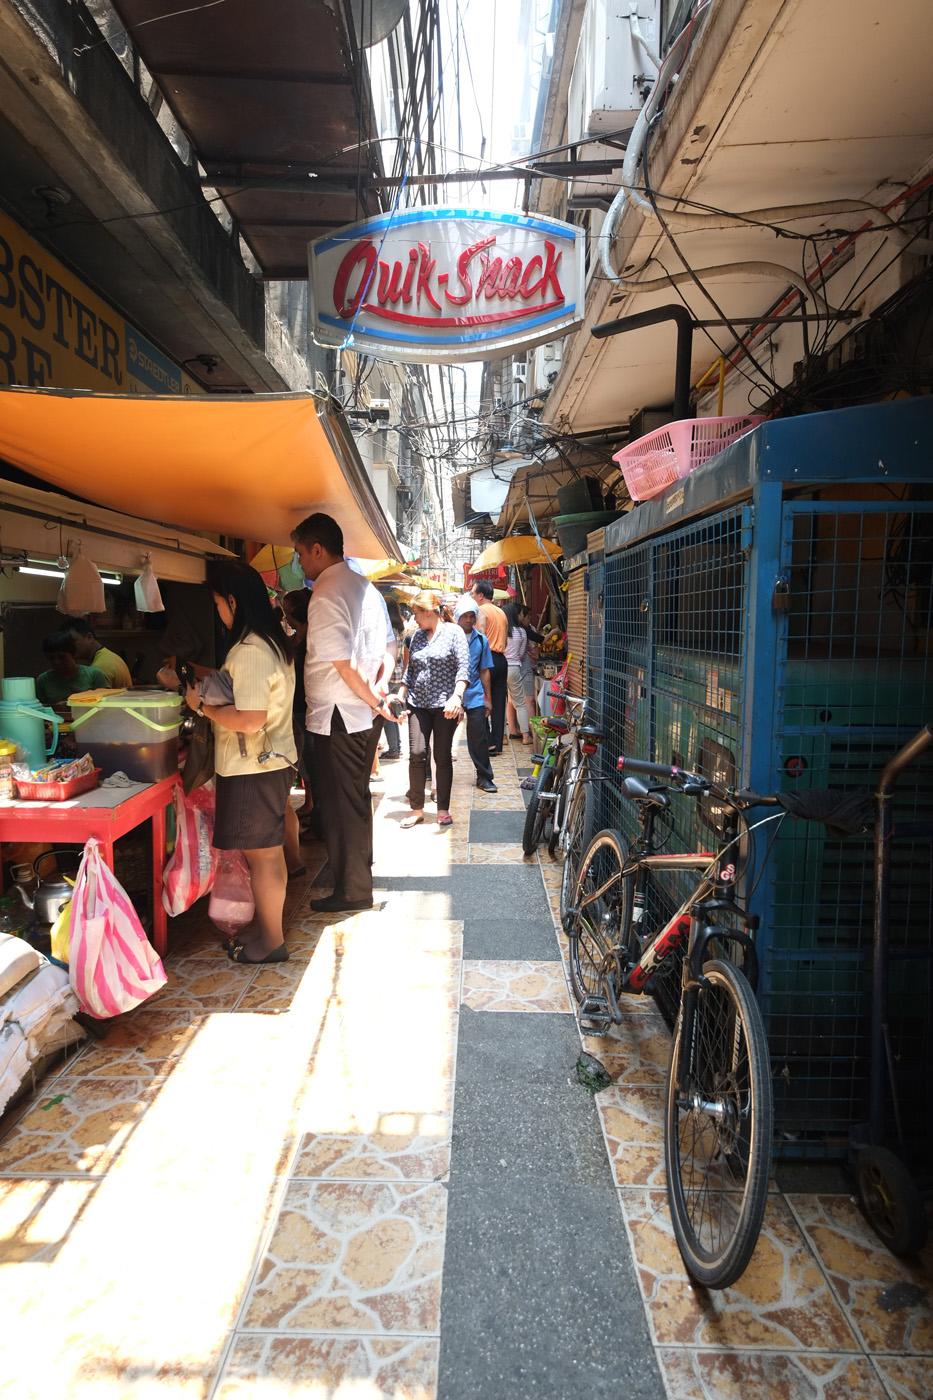 Quik Snack on Carvajal Street